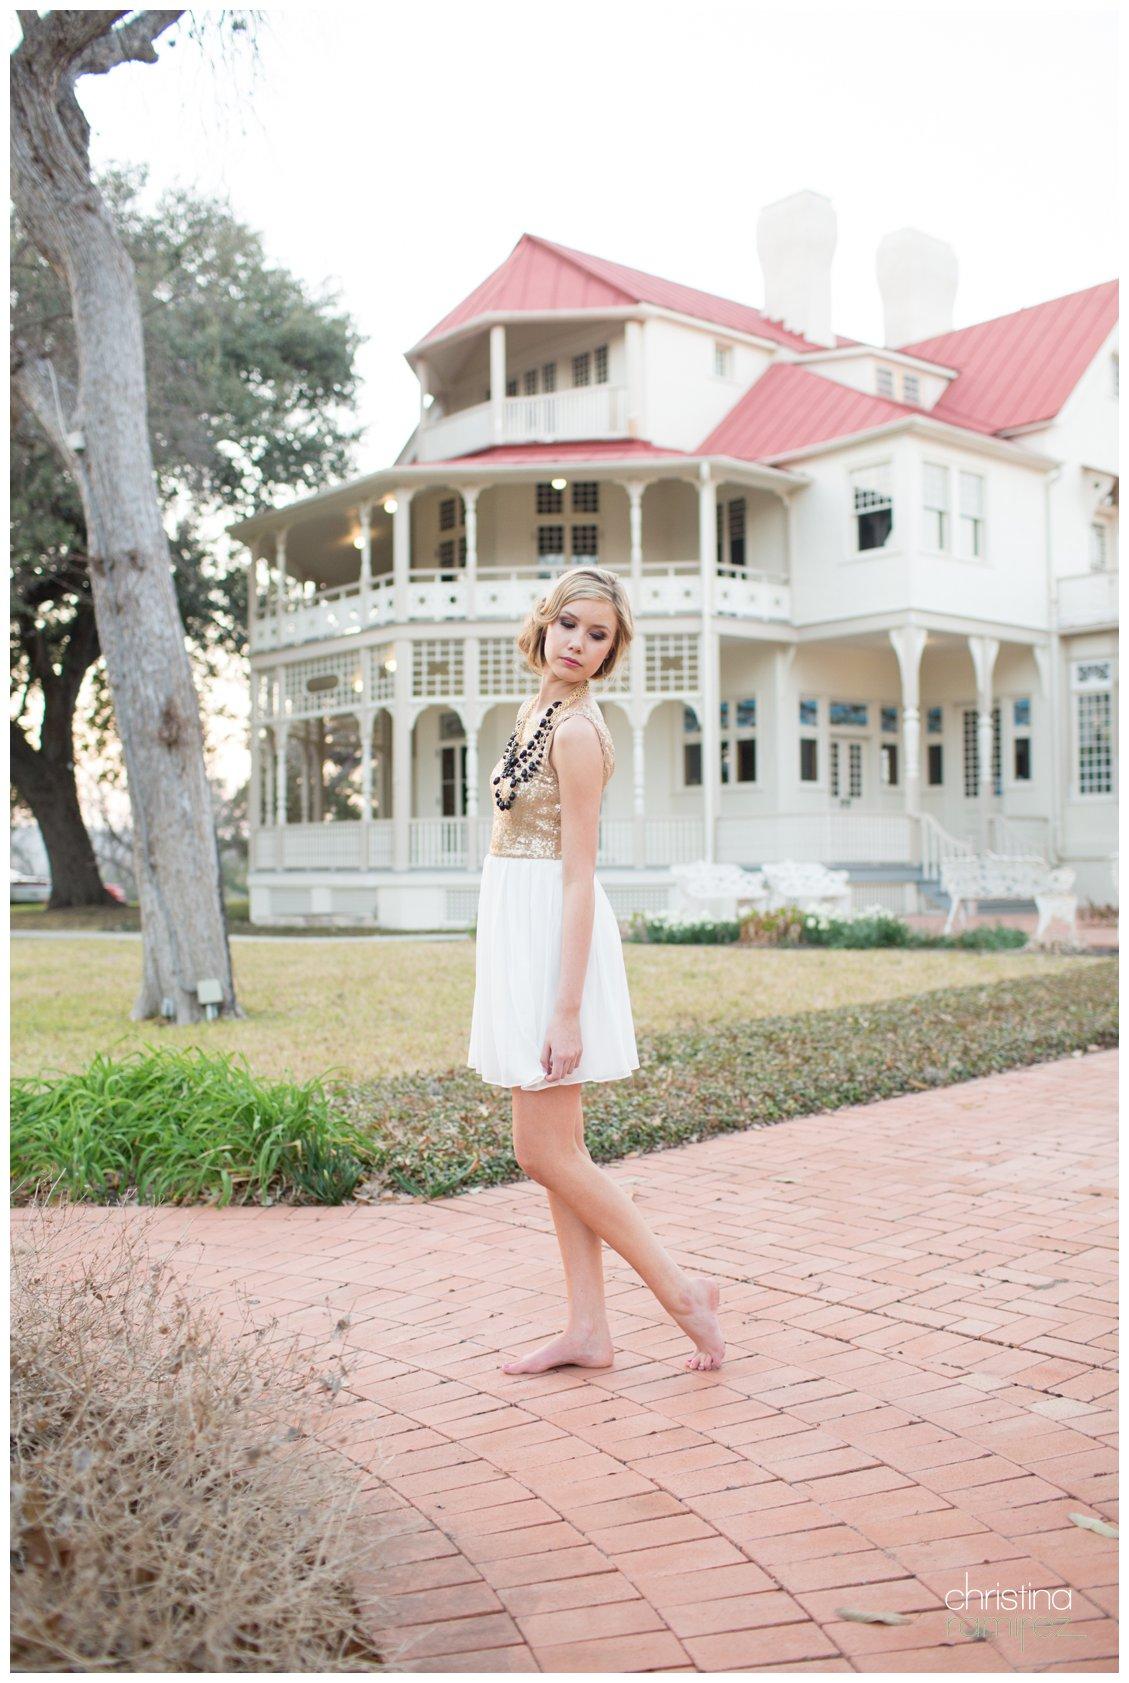 Christina Ramirez Photography,San Antonio Photographer,San Antonio Photographers,San Antonio Senior Photographer,